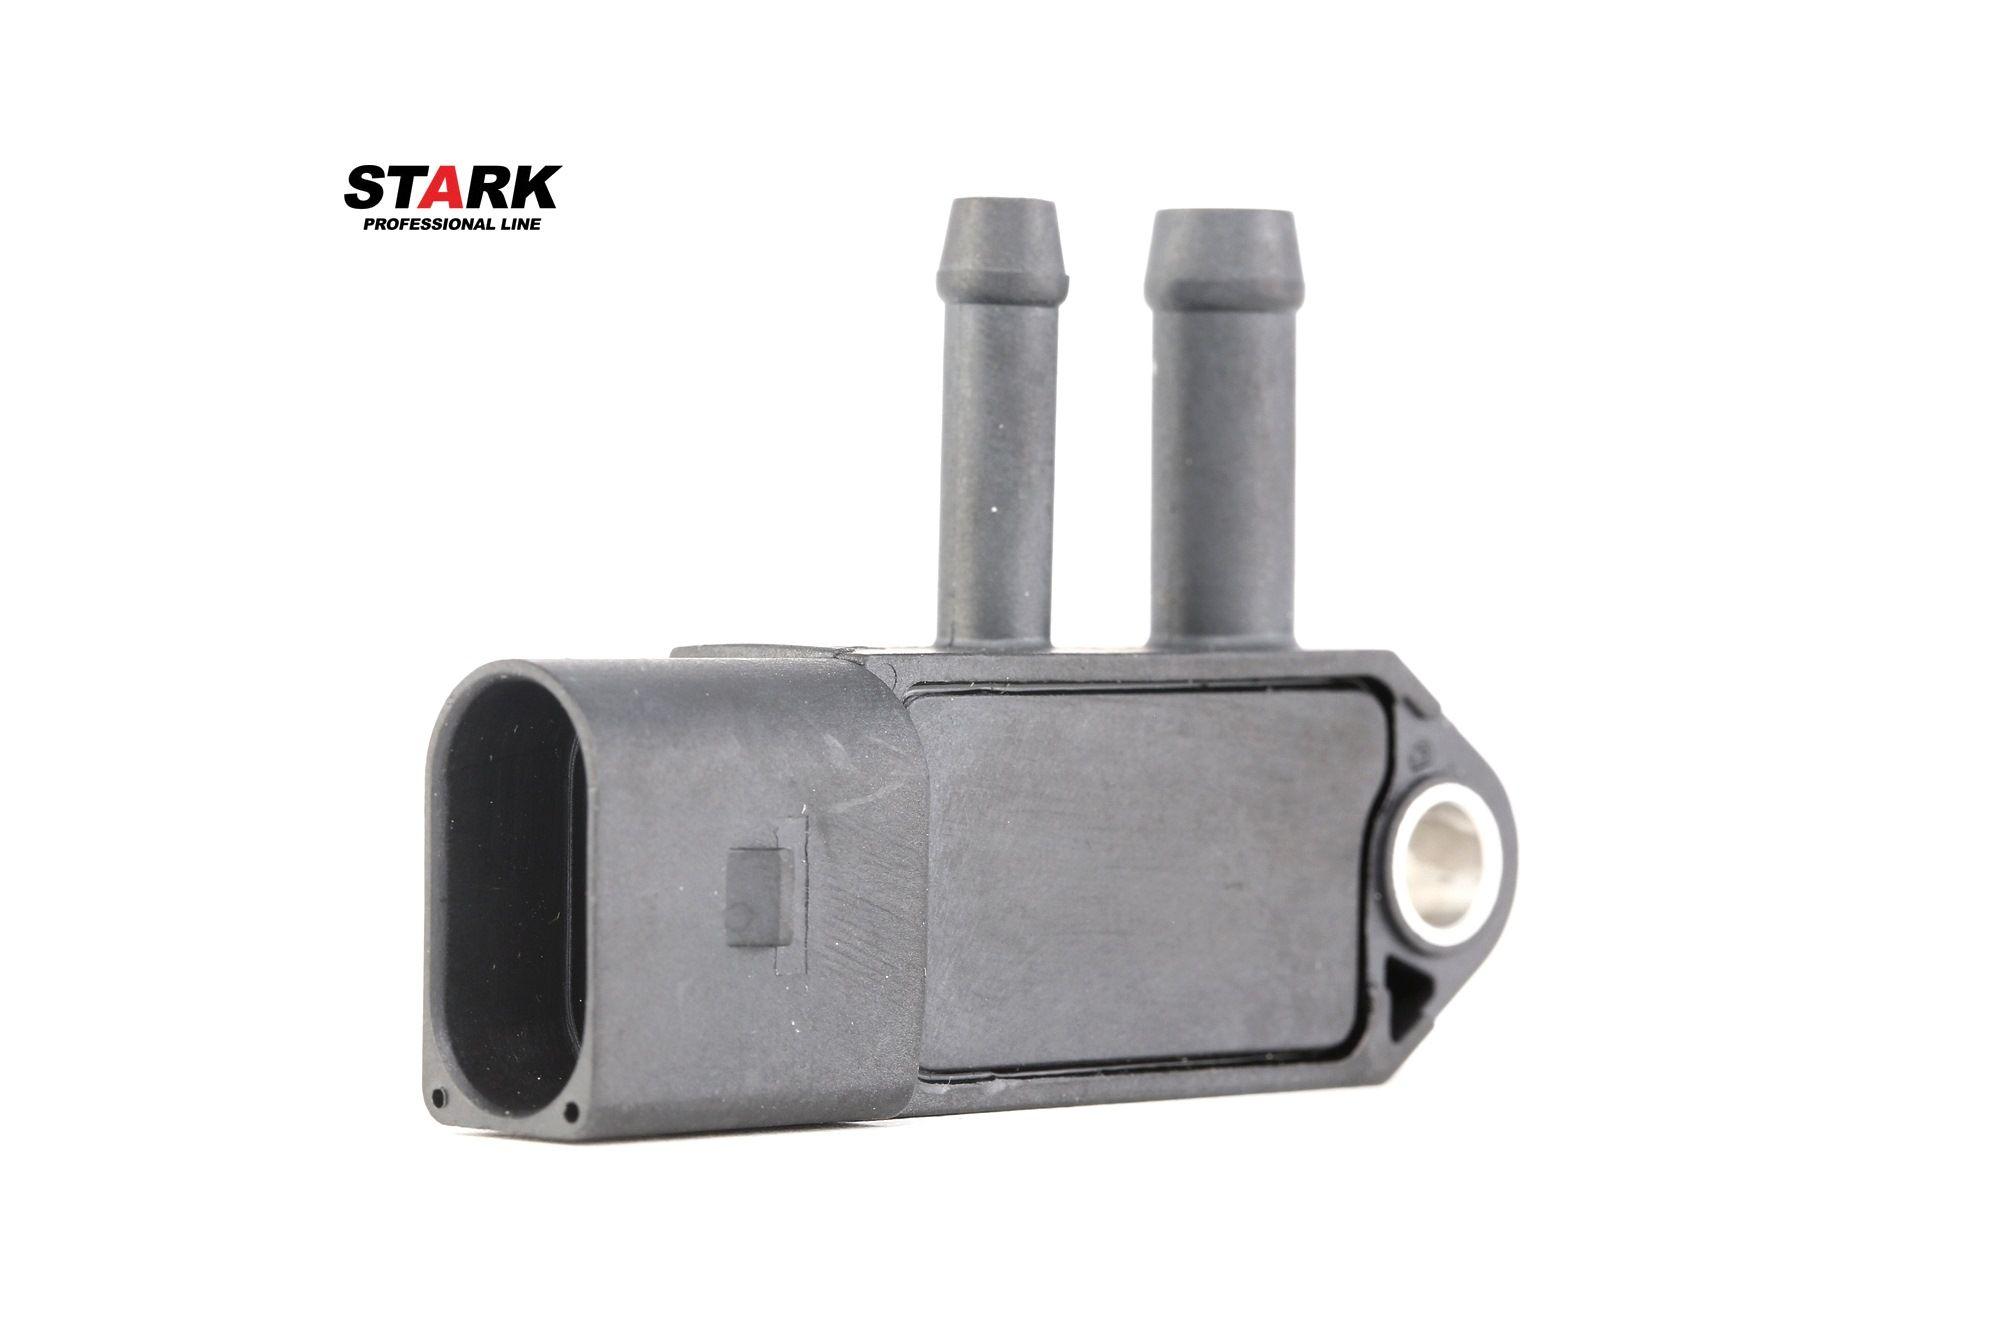 OE Original Differenzdrucksensor SKSEP-1500016 STARK